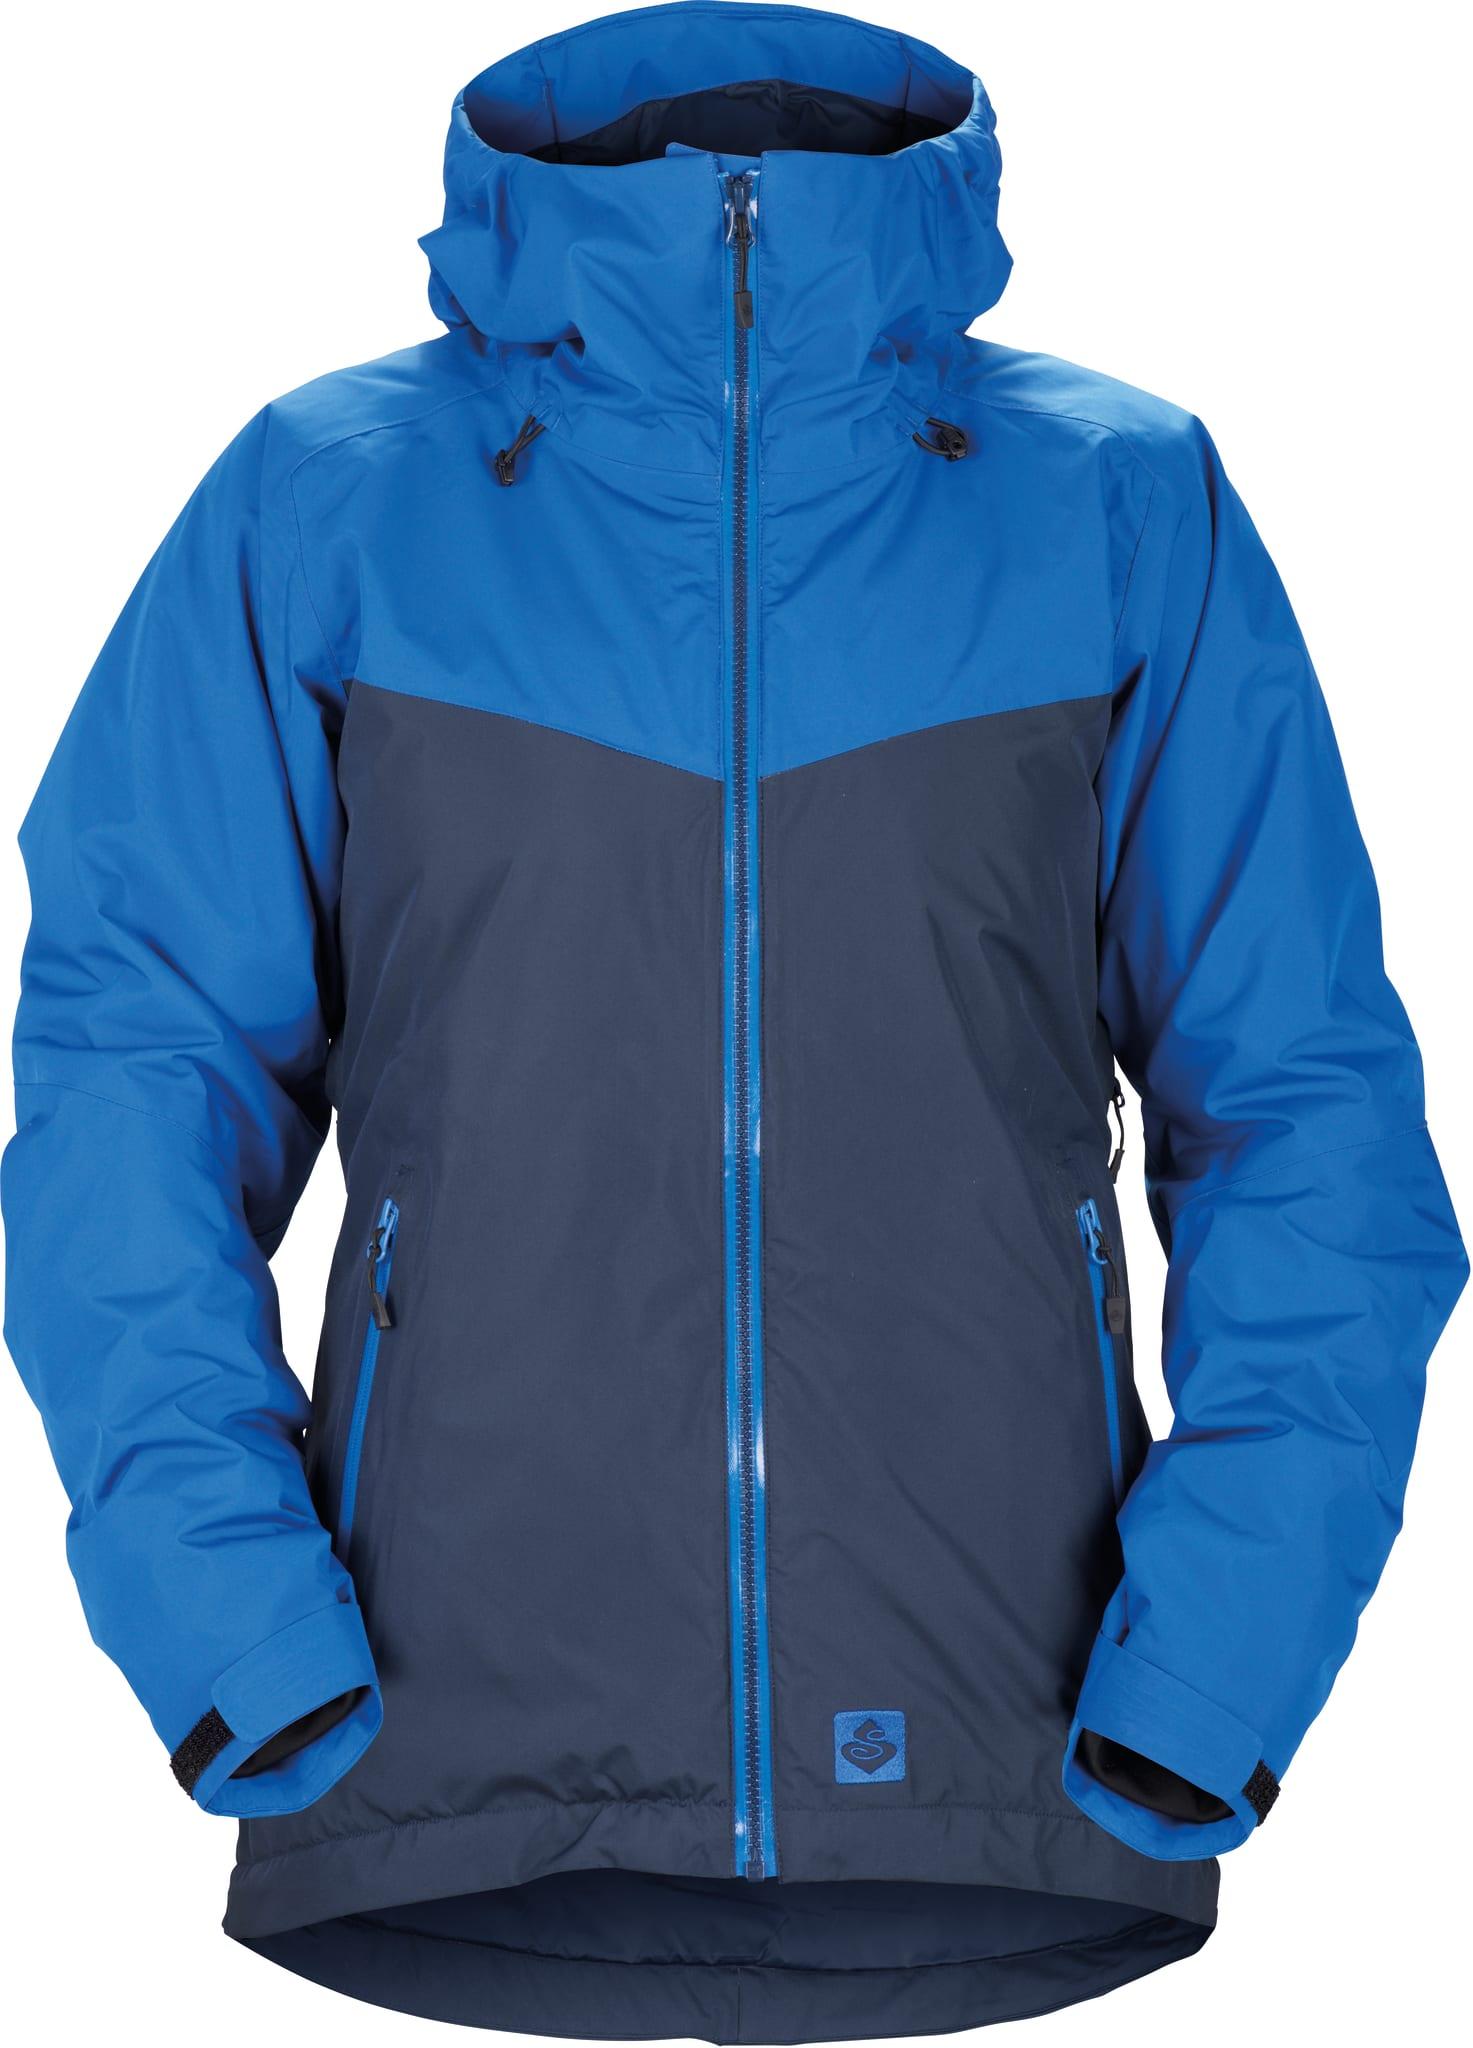 Nightingale Jacket W